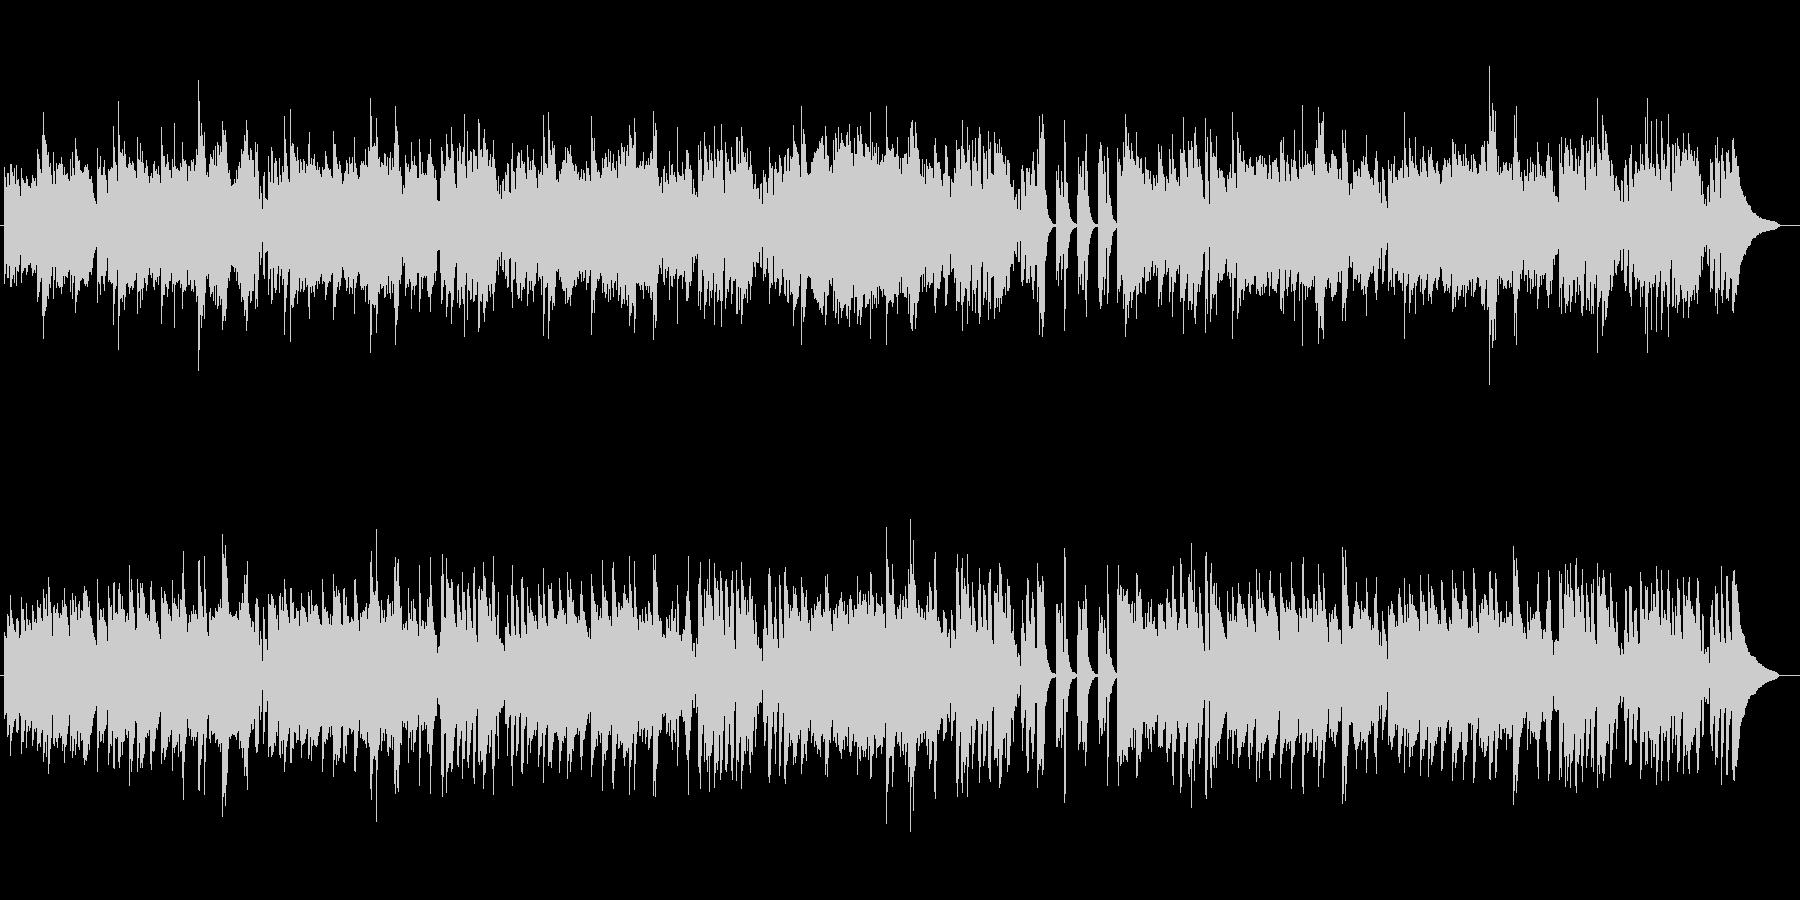 RPGフィールド曲風なオケ曲(ピアノ版)の未再生の波形